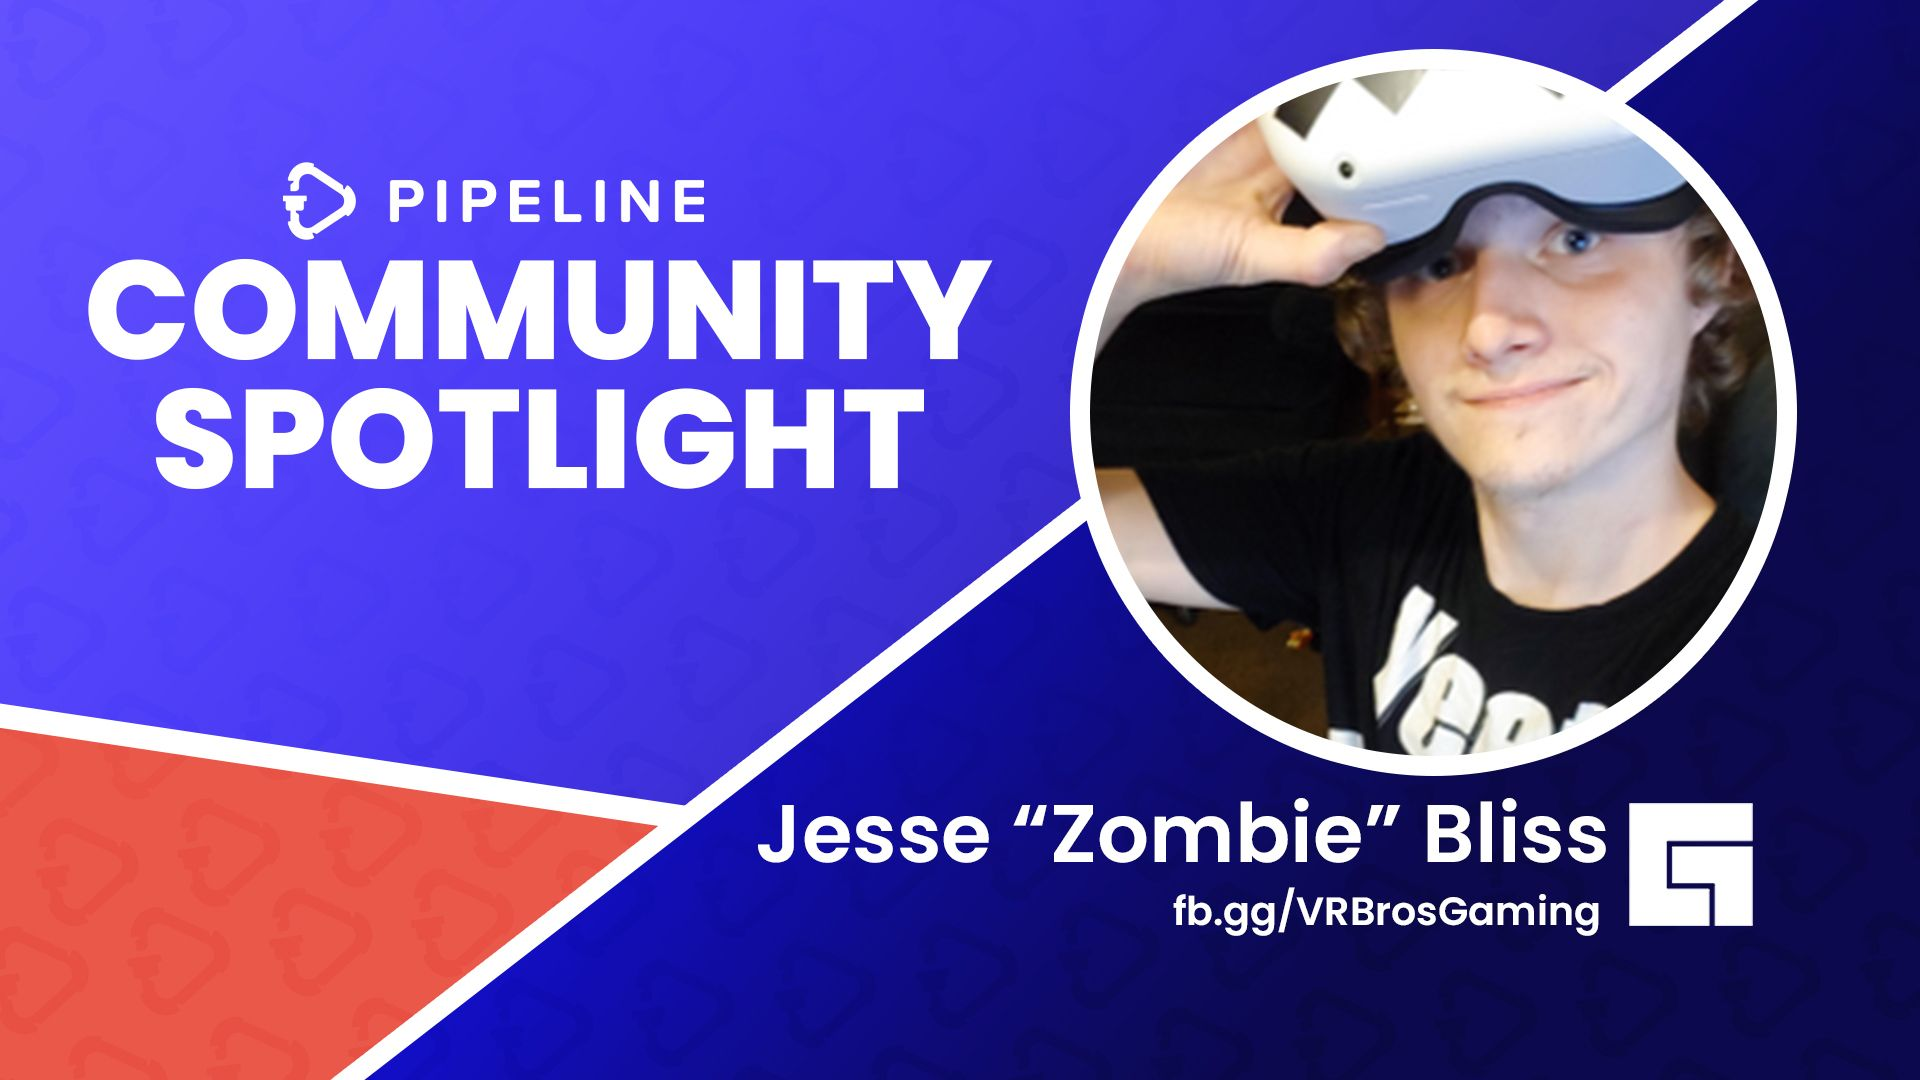 Community Spotlight: Zombie